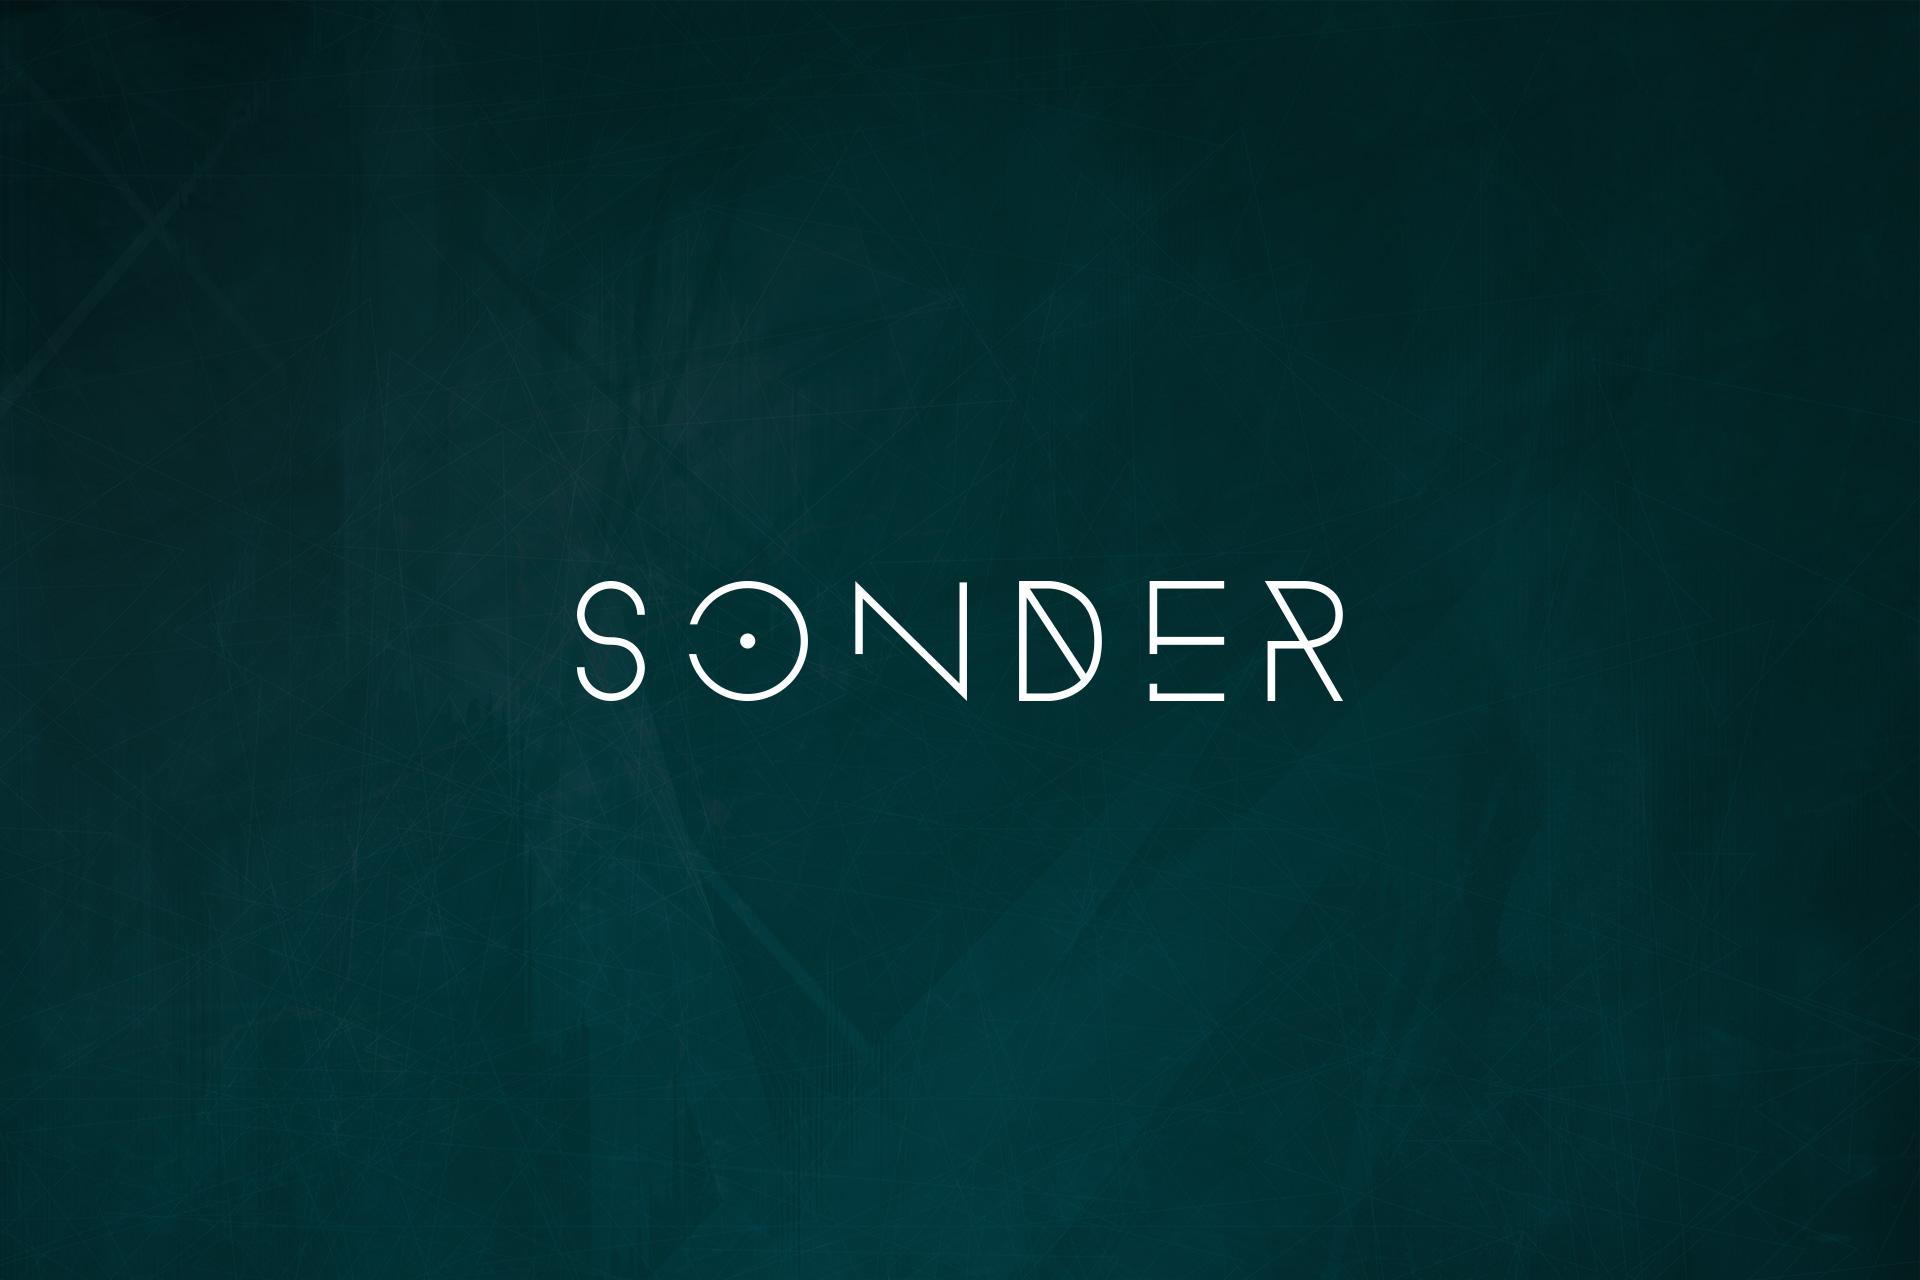 sonder-big-09